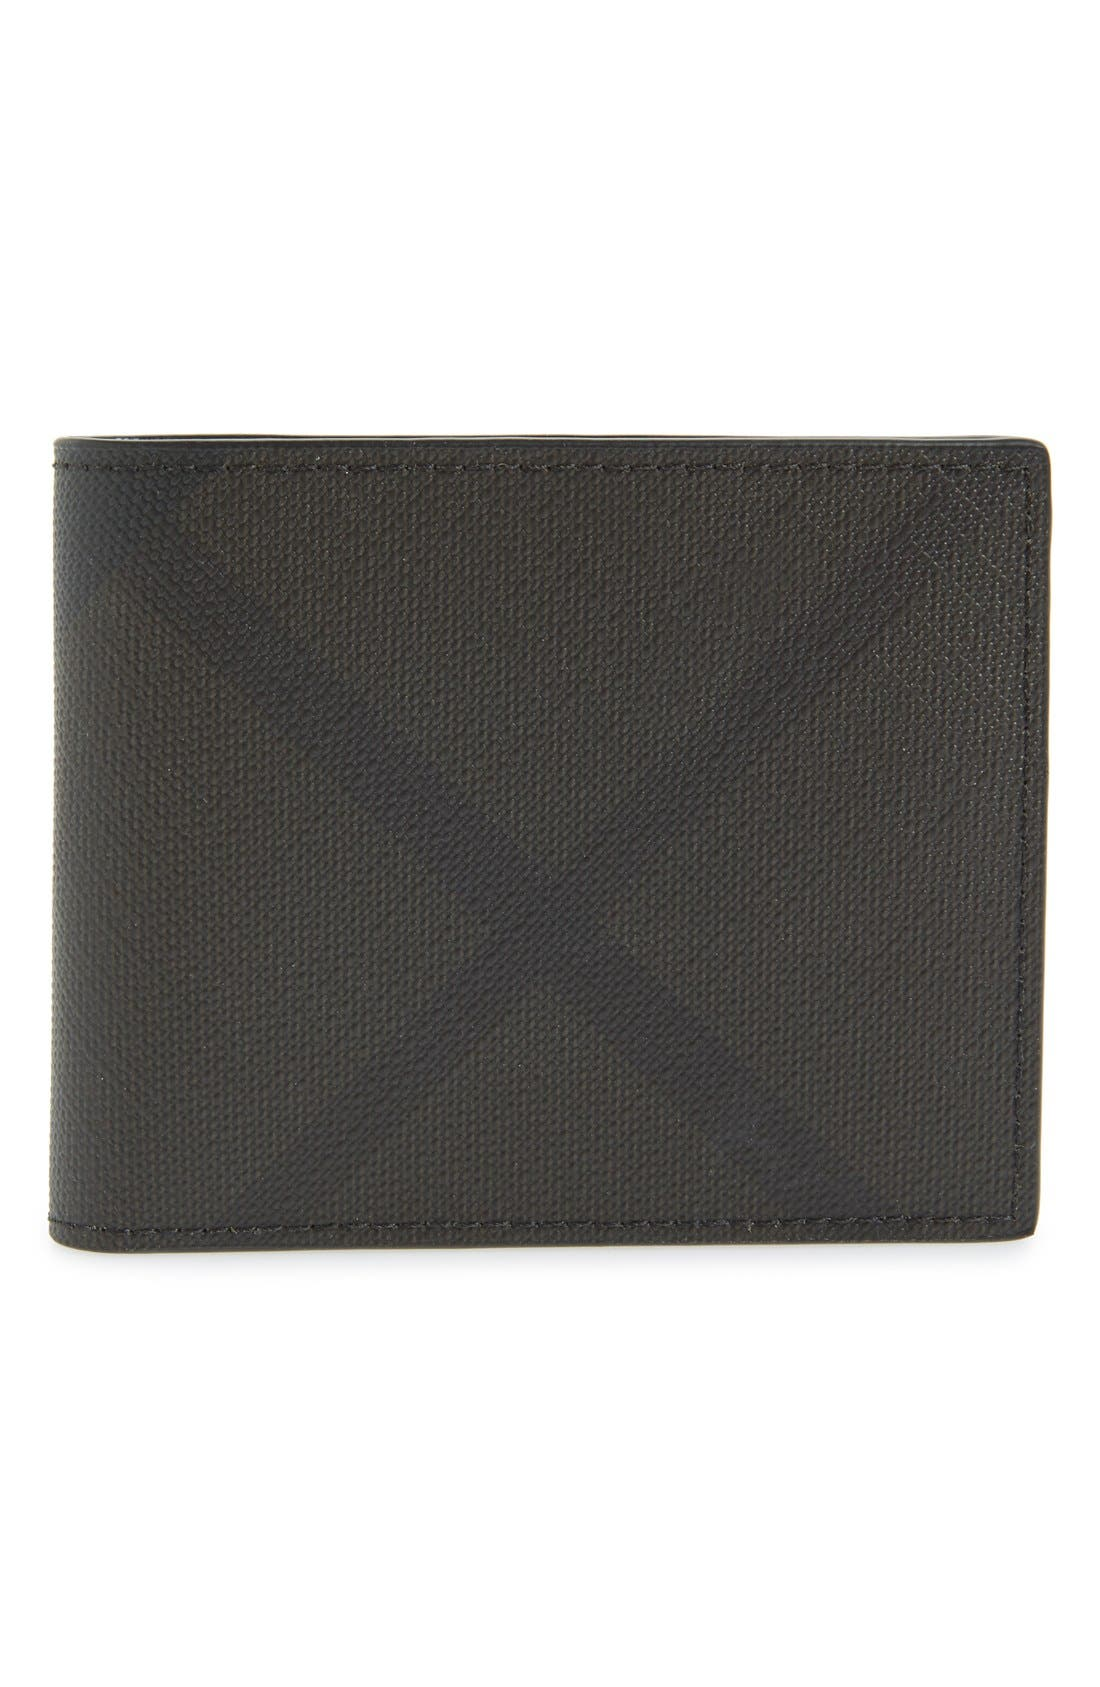 Check Wallet,                         Main,                         color, Chocolate/ Black